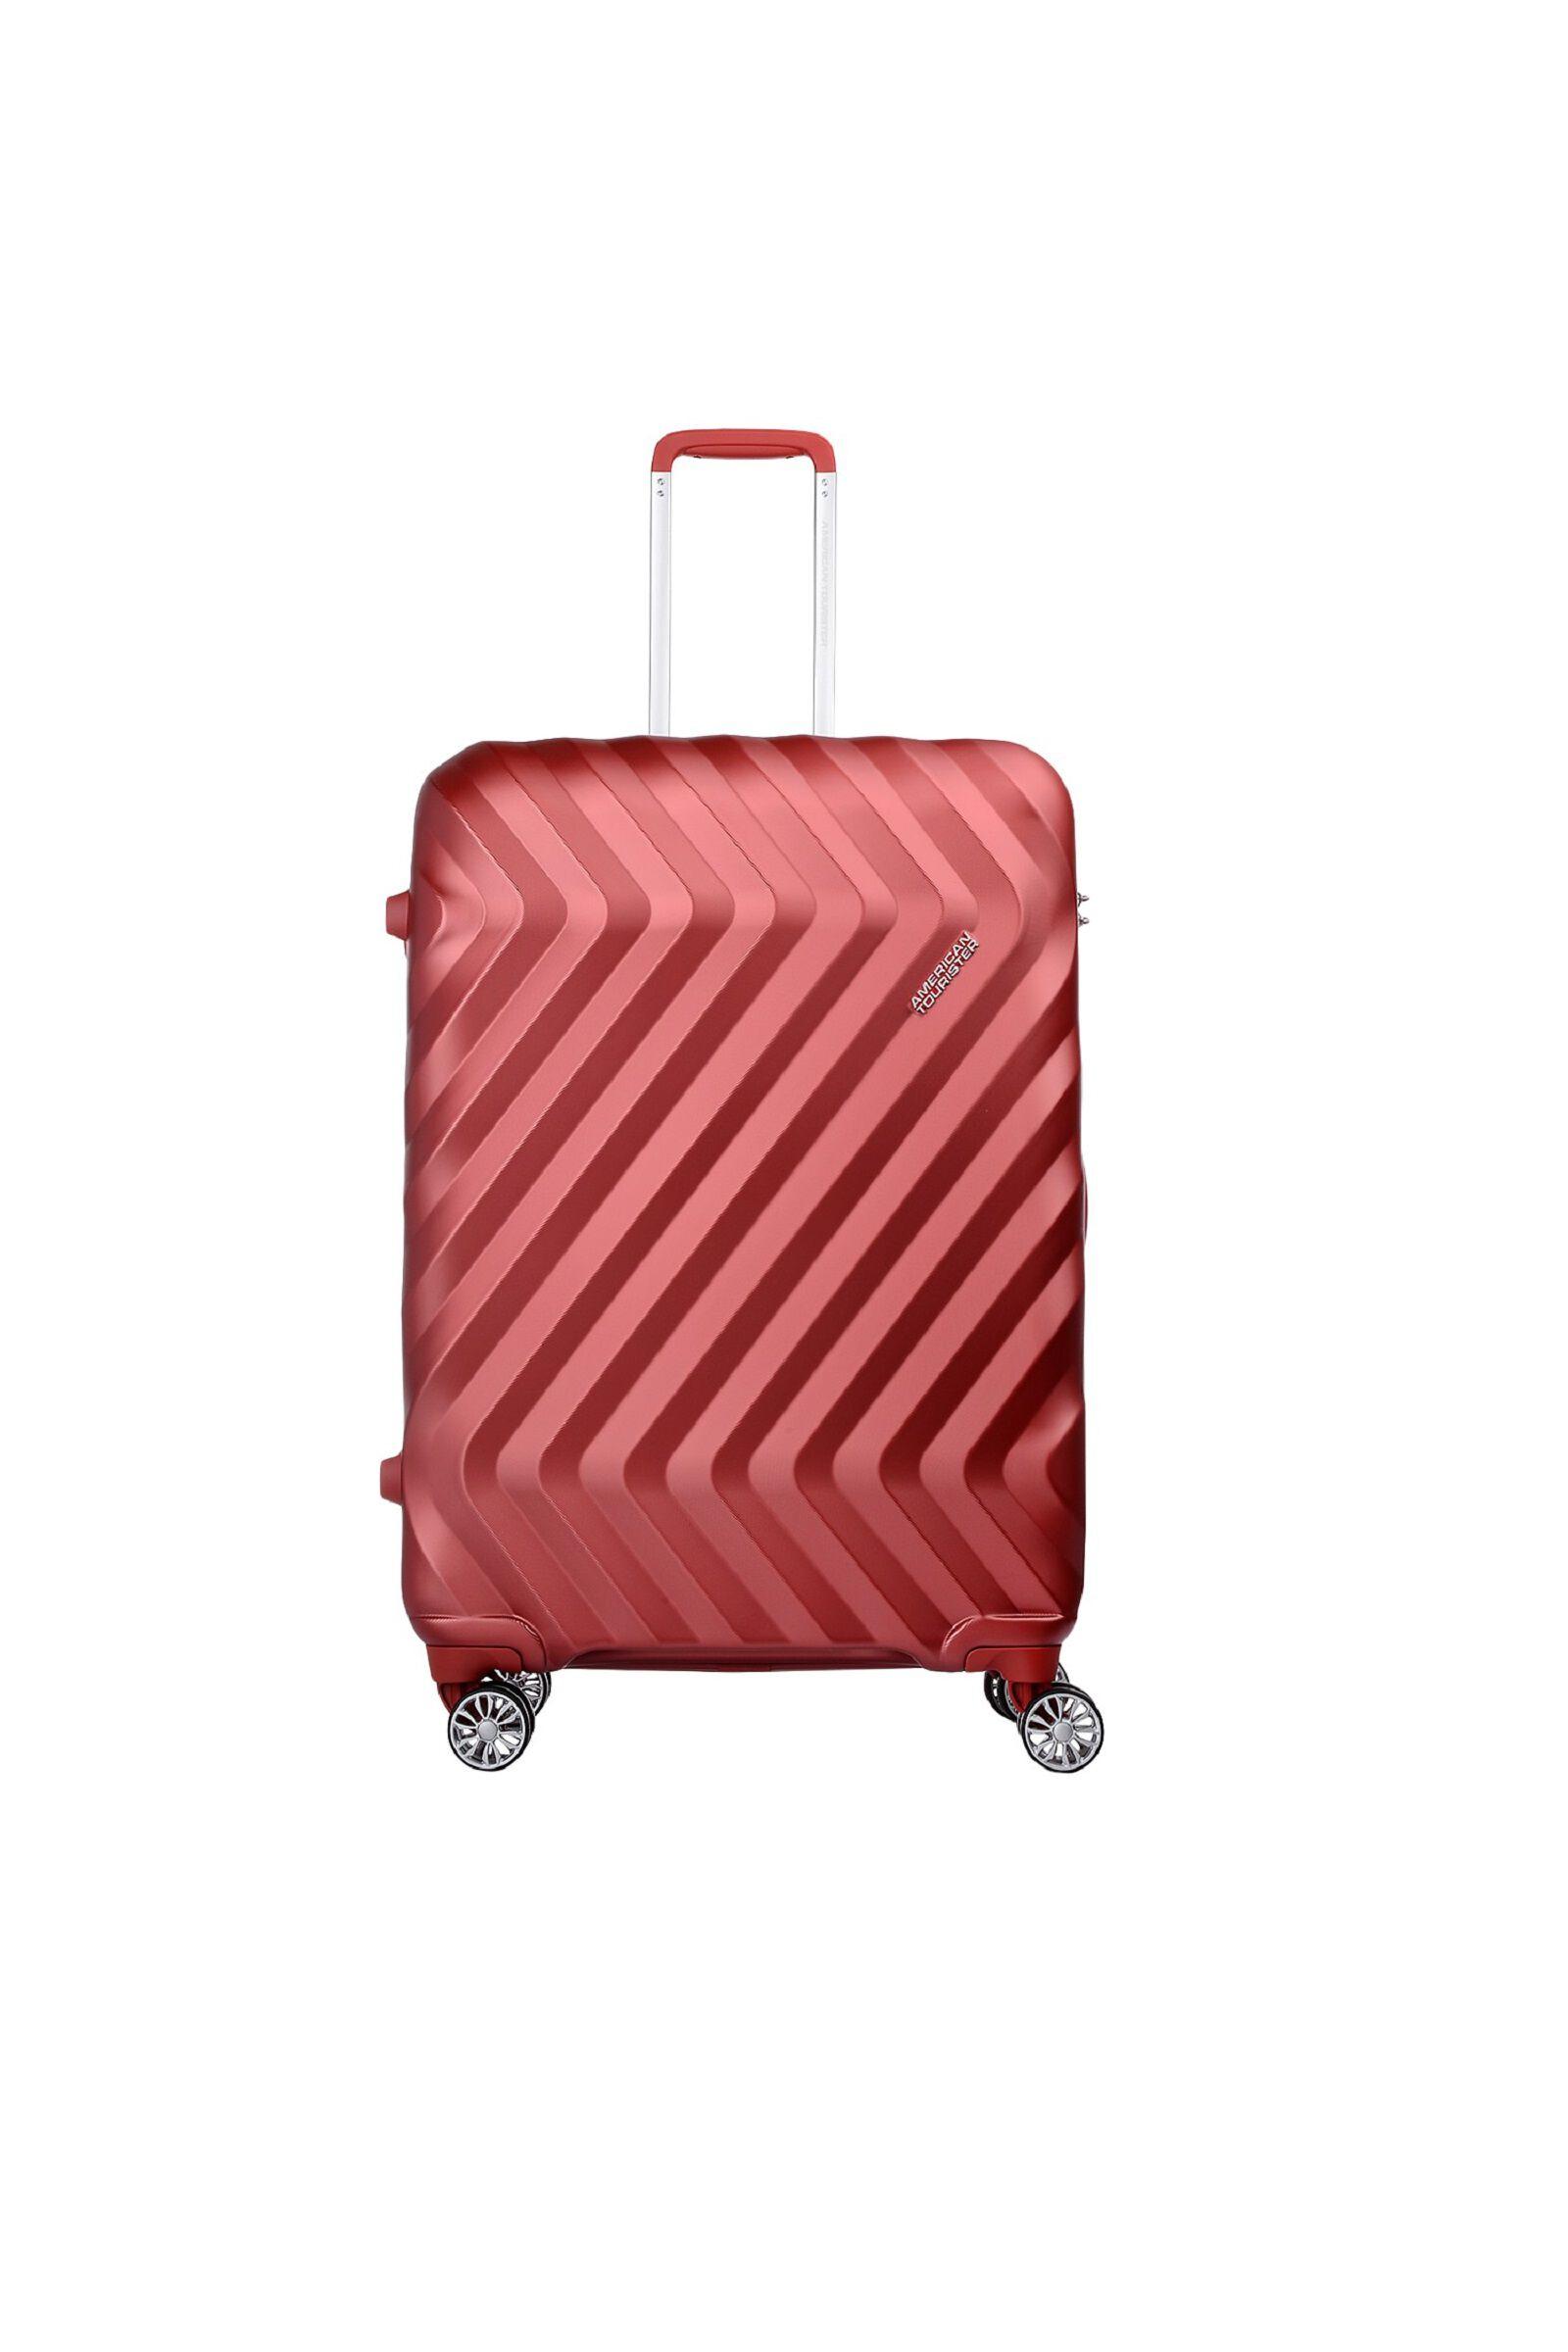 American Tourister ZAVIS 行李箱 67厘米/24吋